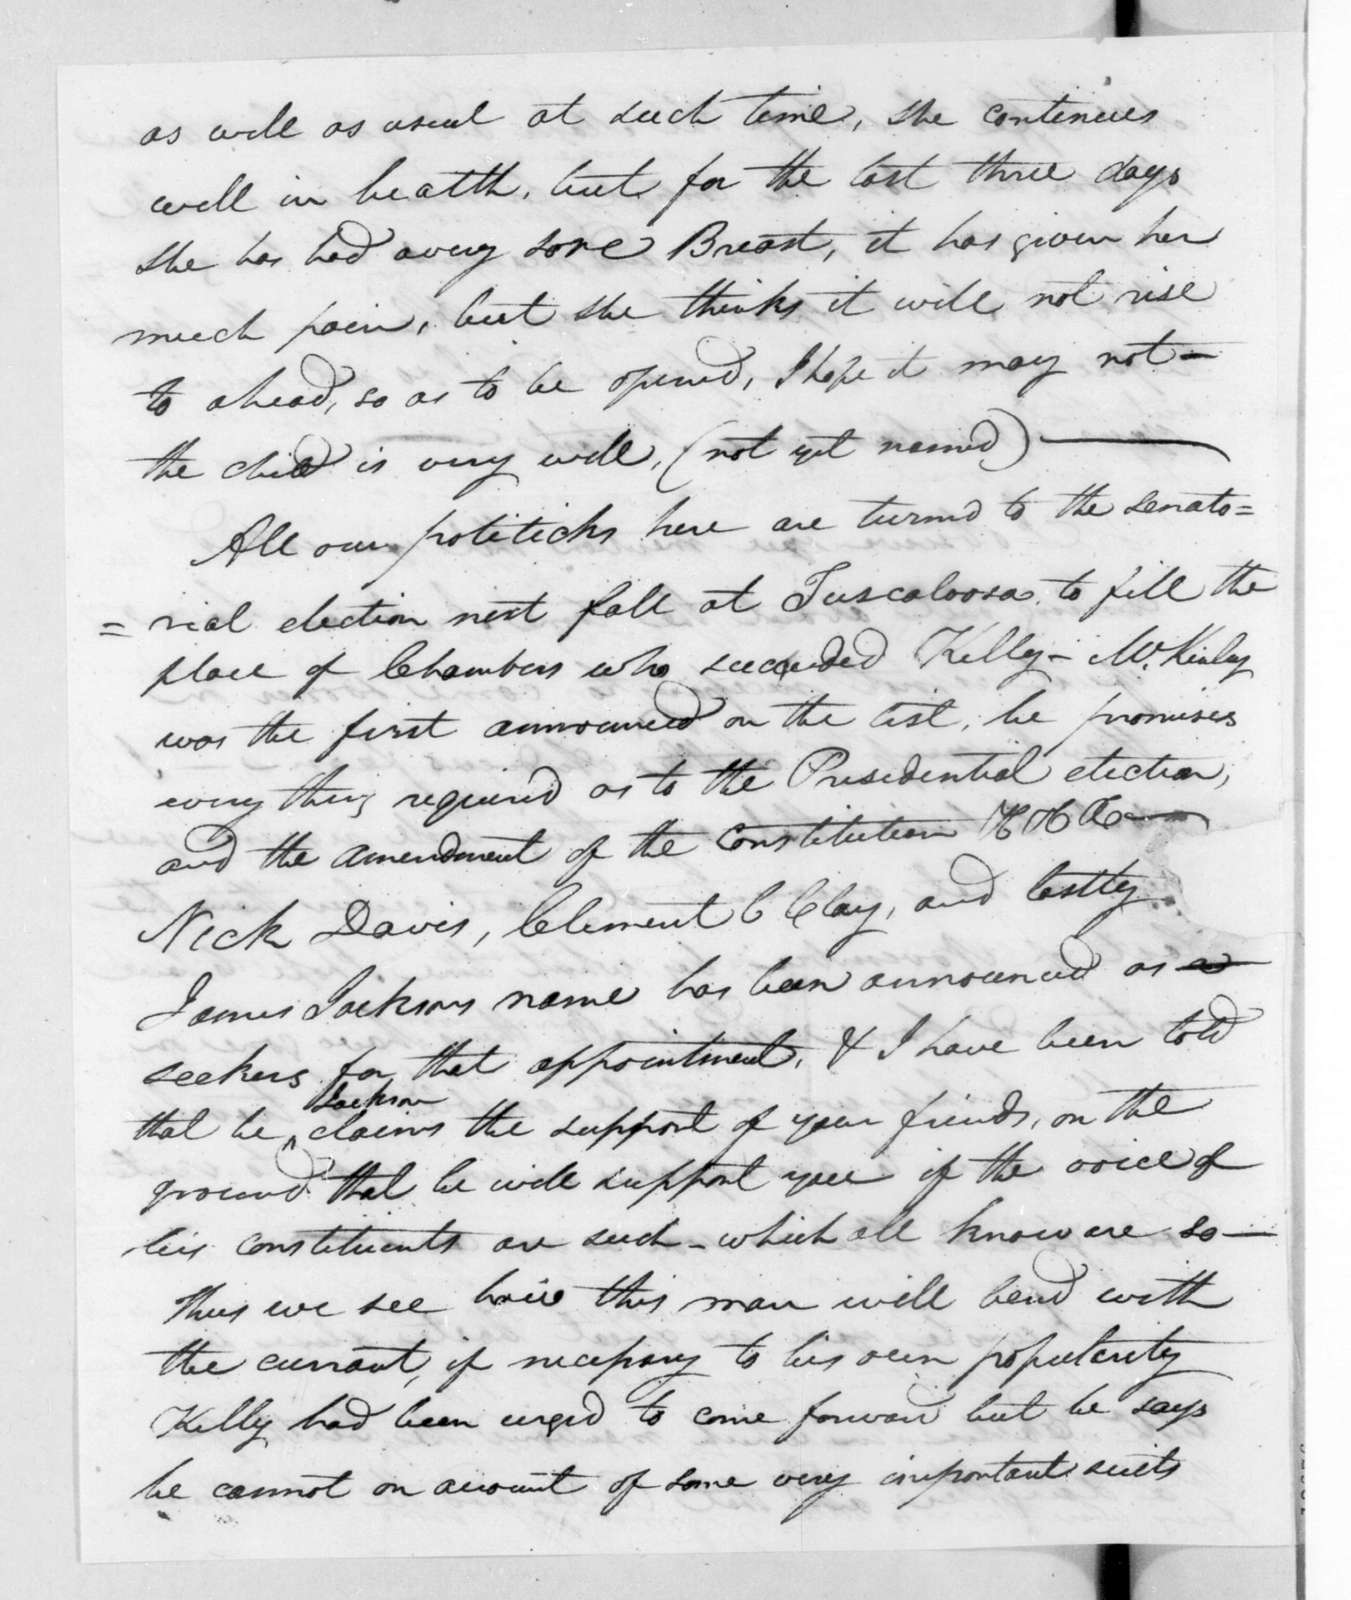 John Coffee to Andrew Jackson, October 1, 1826